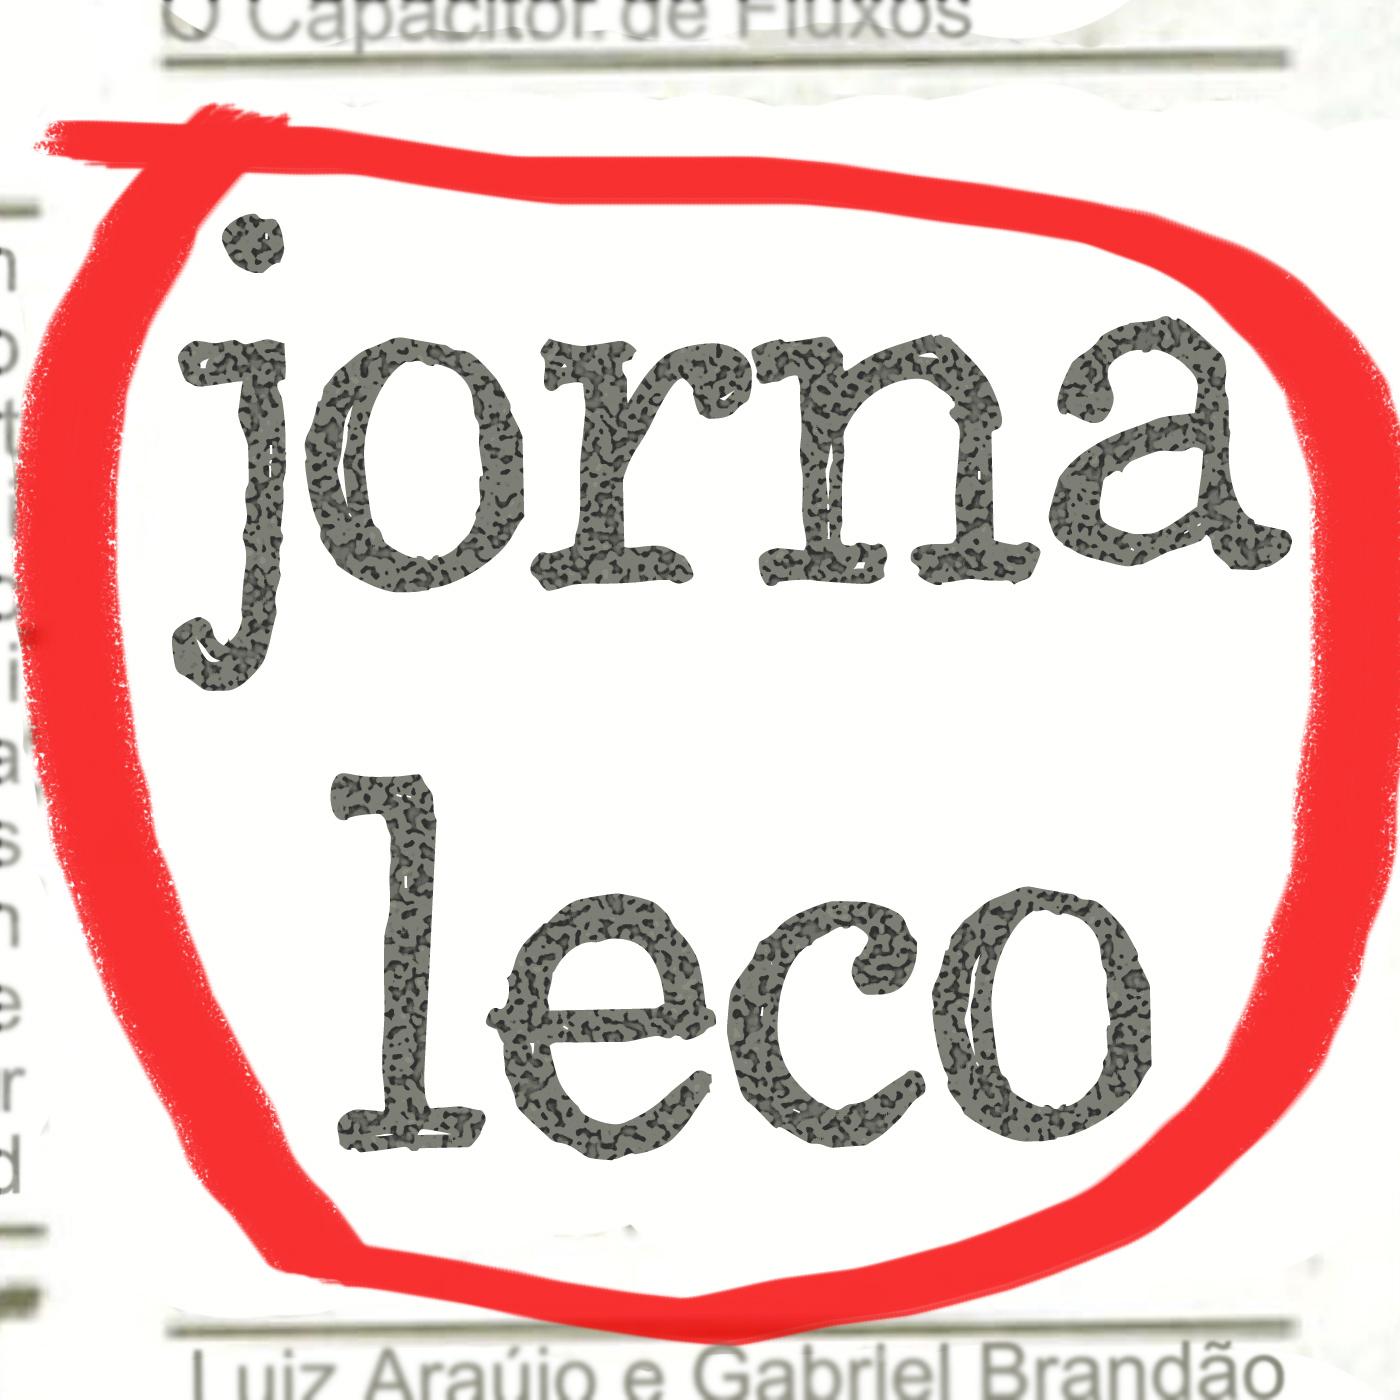 Jornaleco